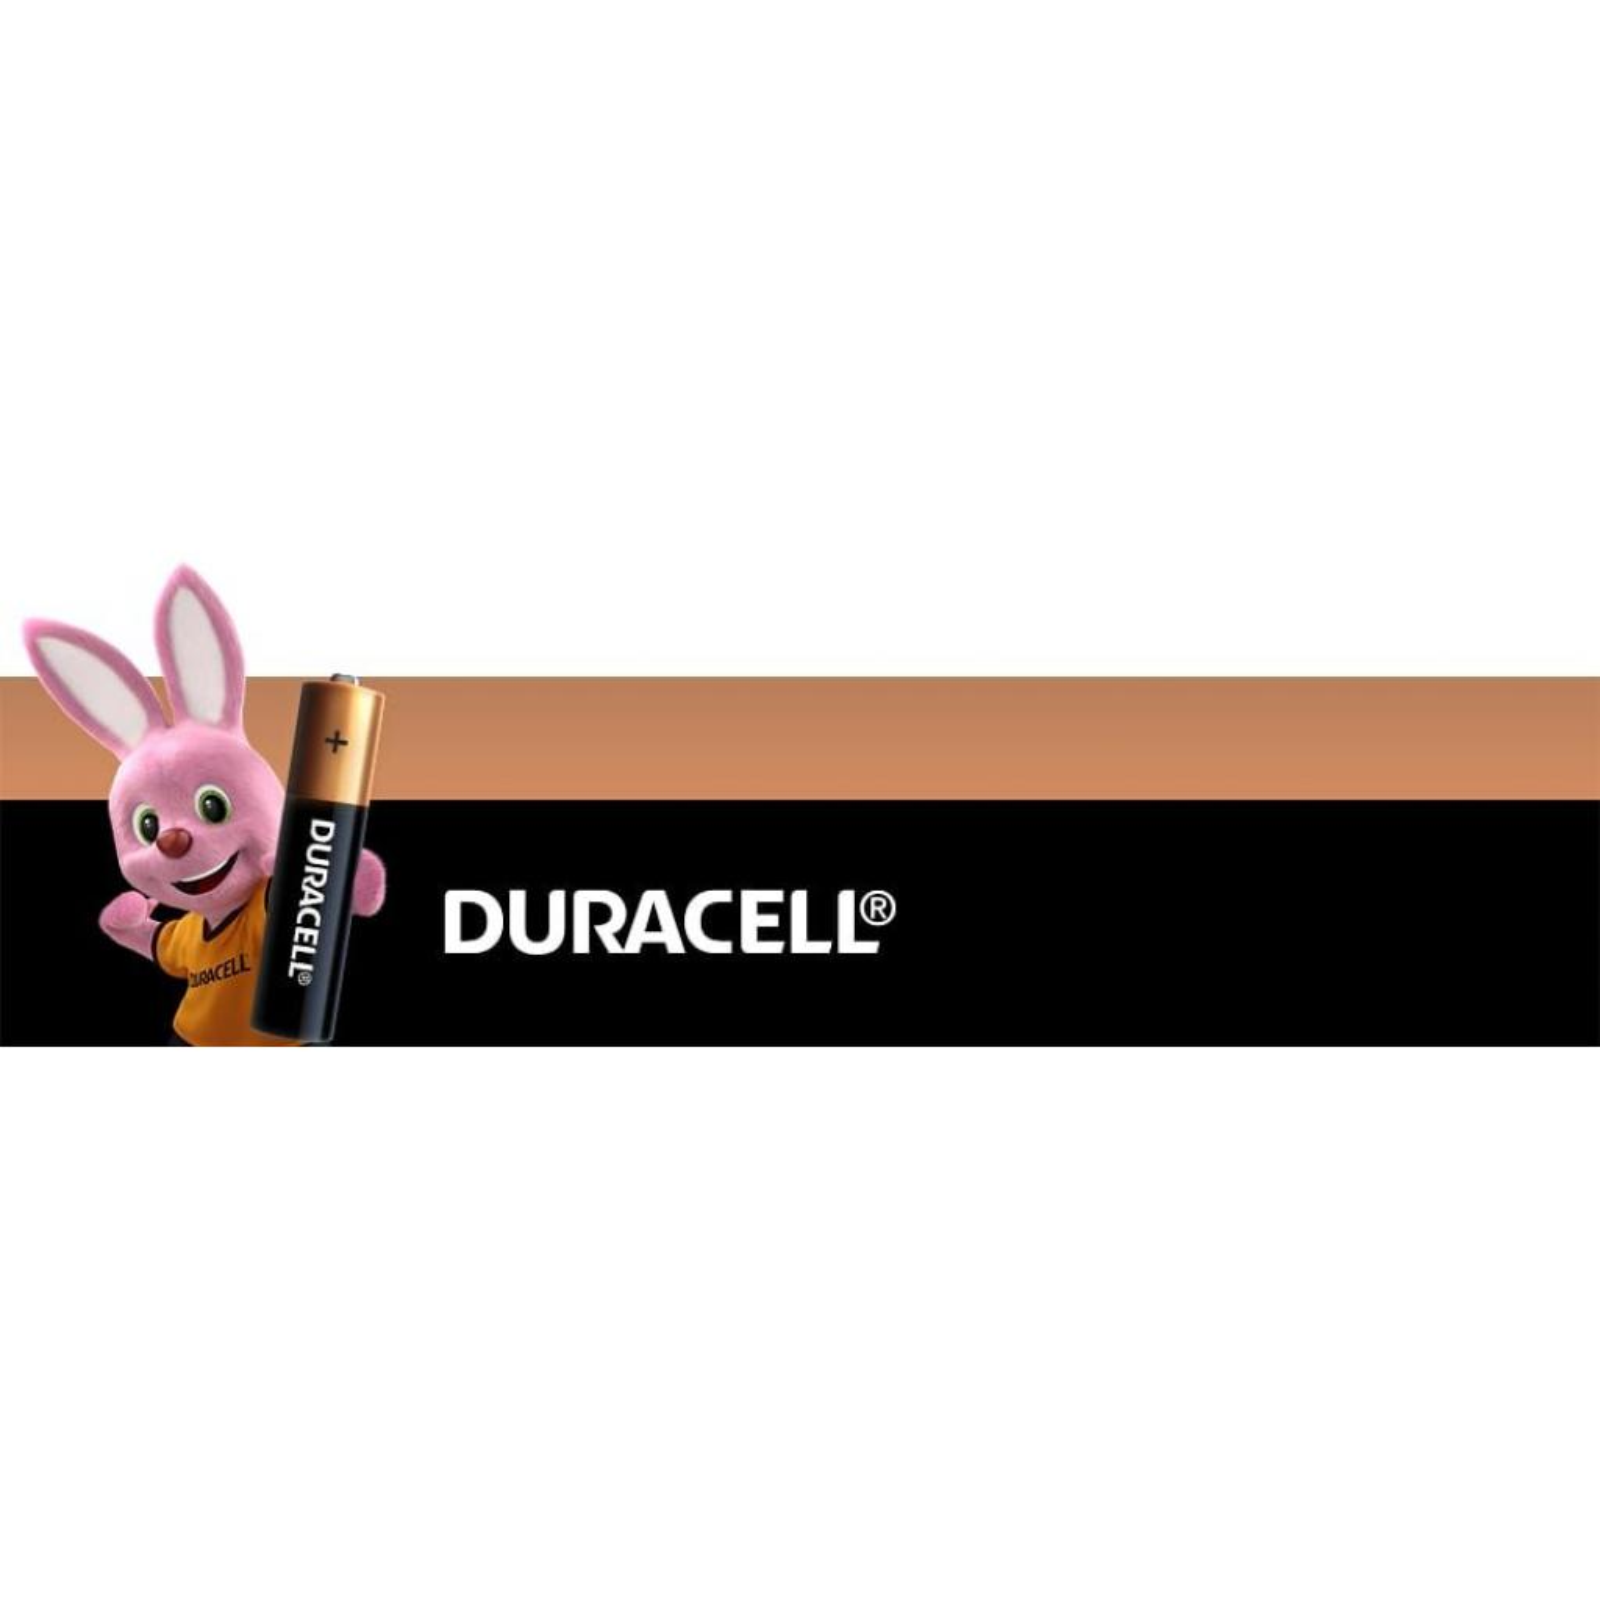 Батарейка Duracell AAA MN2400 LR03 * 4 (5000394052543 / 81545421) изображение 7